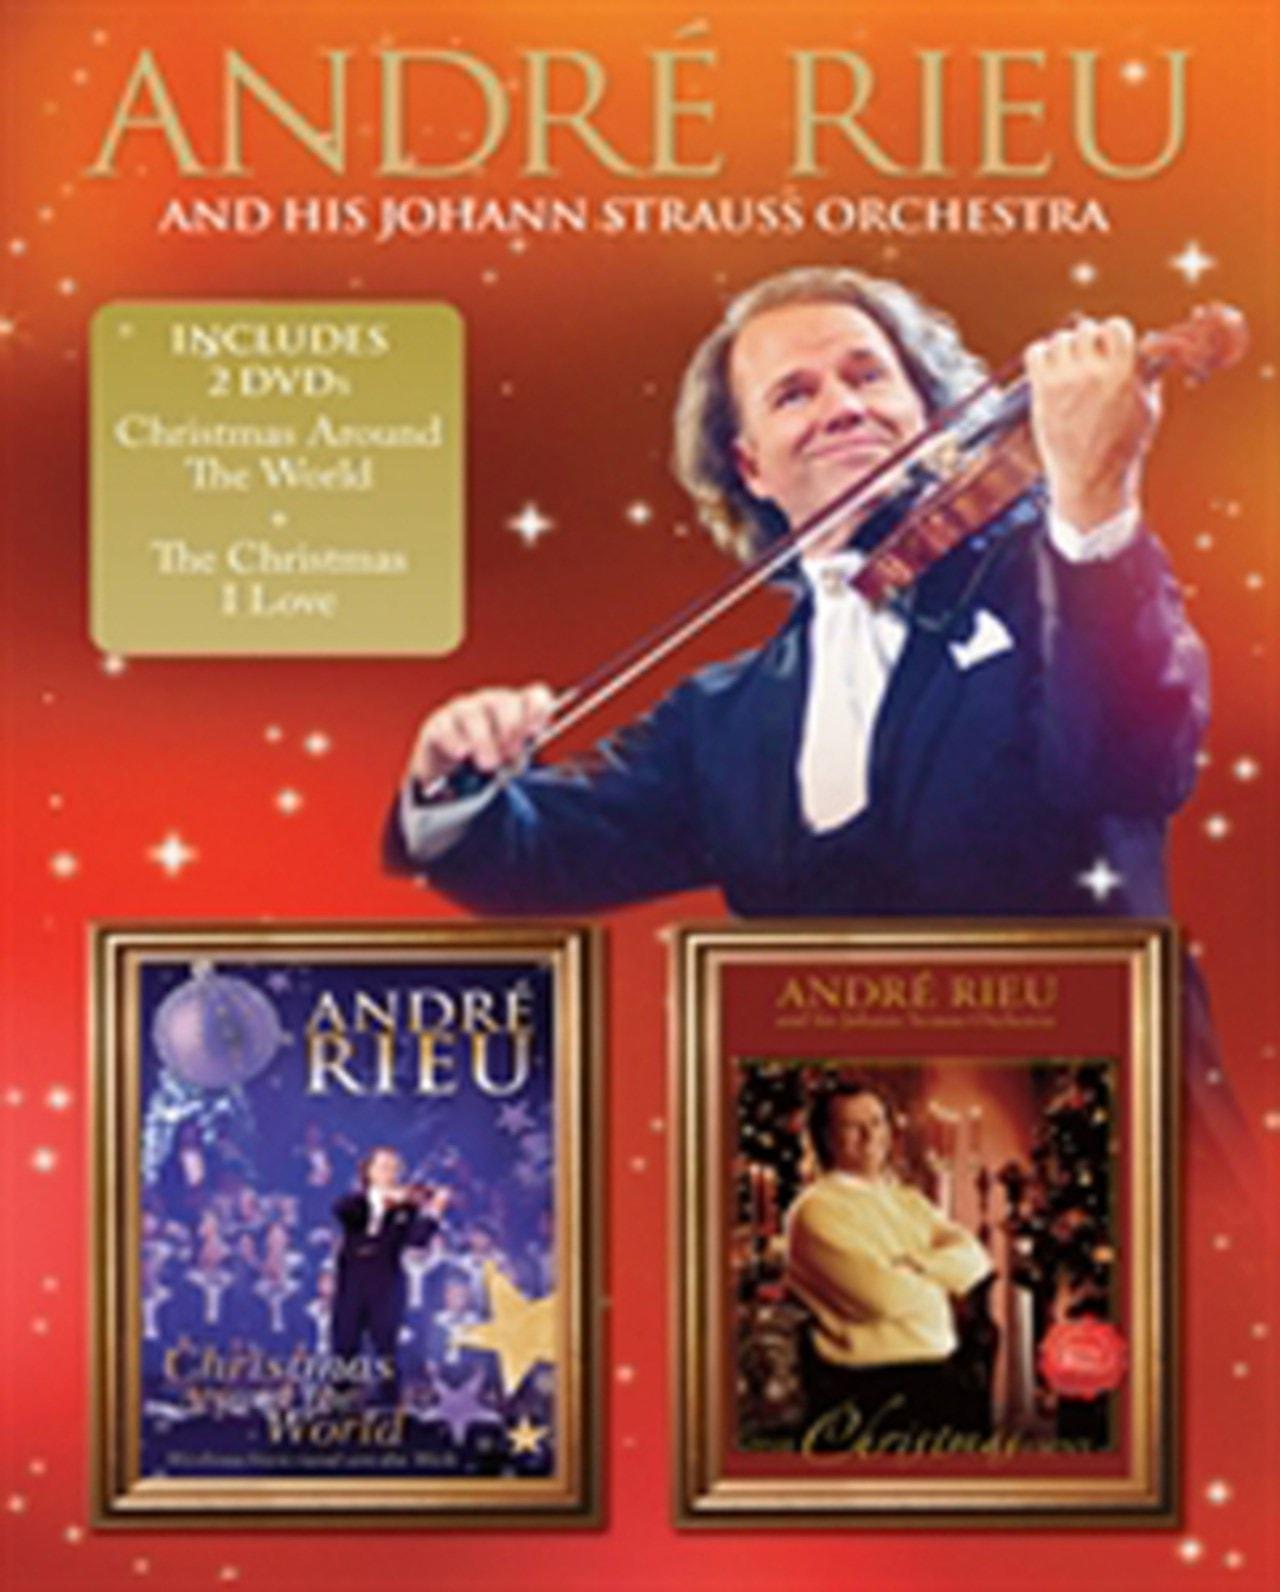 Andre Rieu: Christmas Around the World/The Christmas I Love - 1